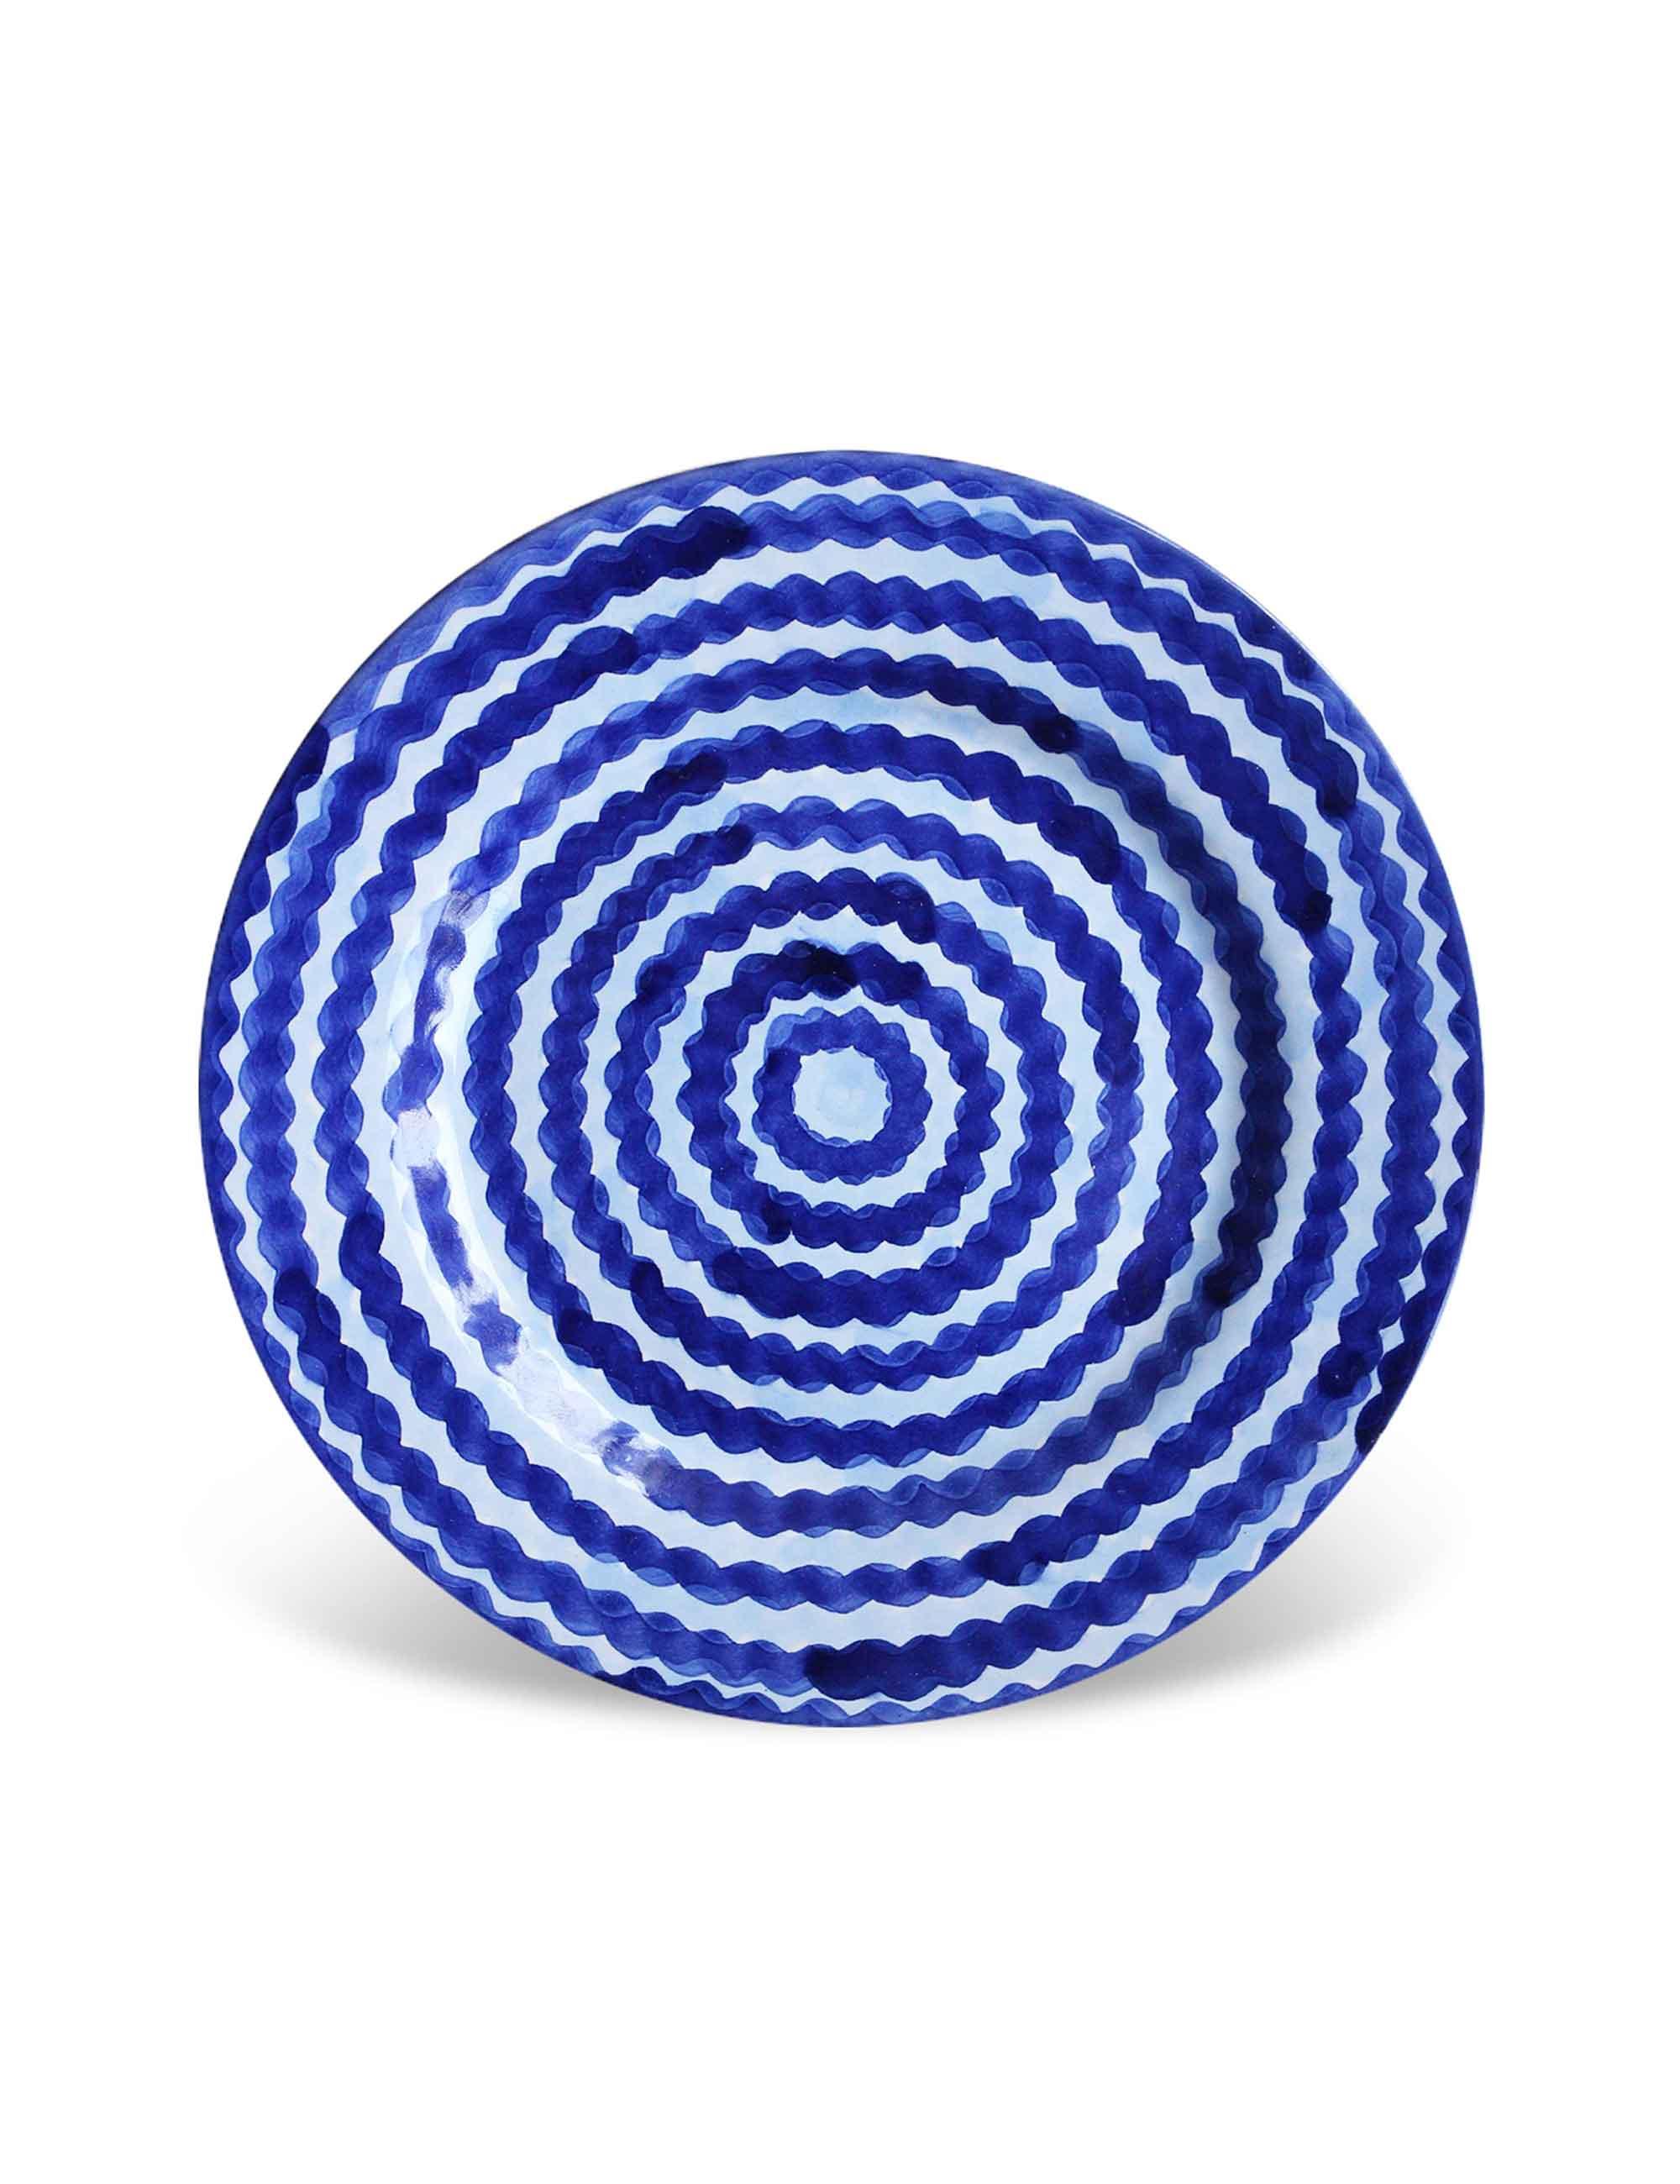 Piatto dessert Mediterra in ceramica decorata di Caltagirone blu profondo